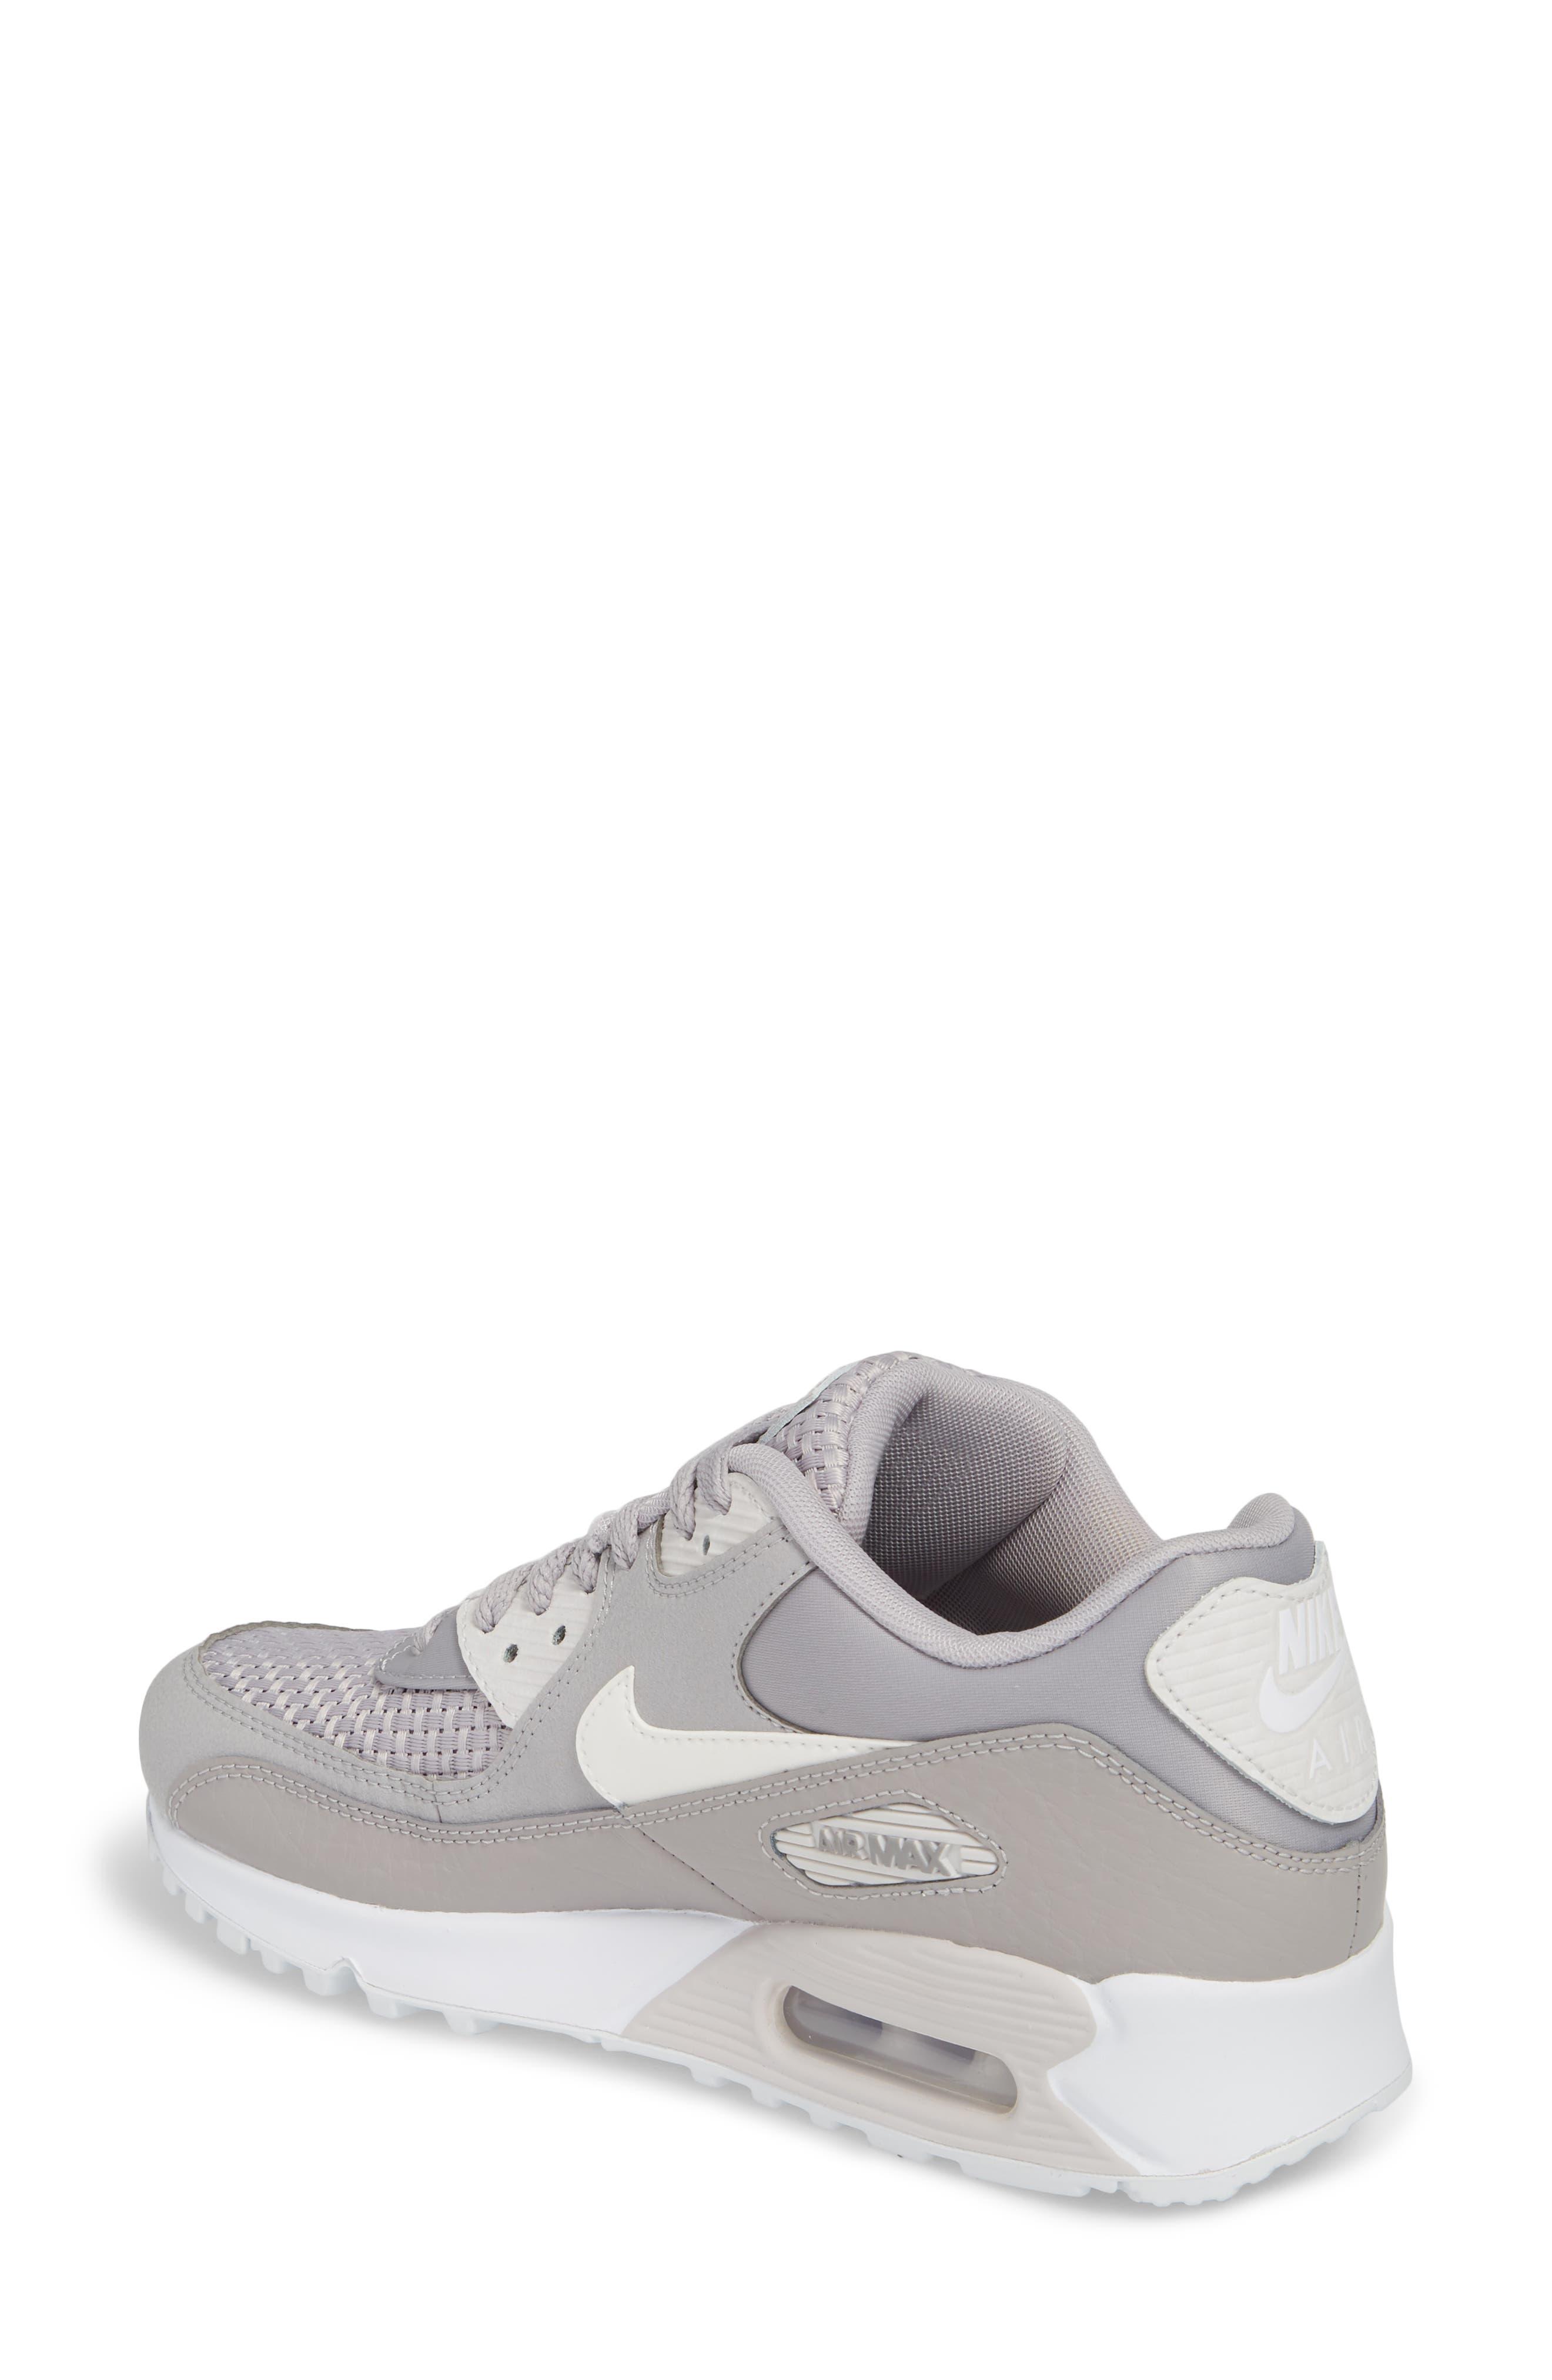 Air Max 90 SE Sneaker,                             Alternate thumbnail 10, color,